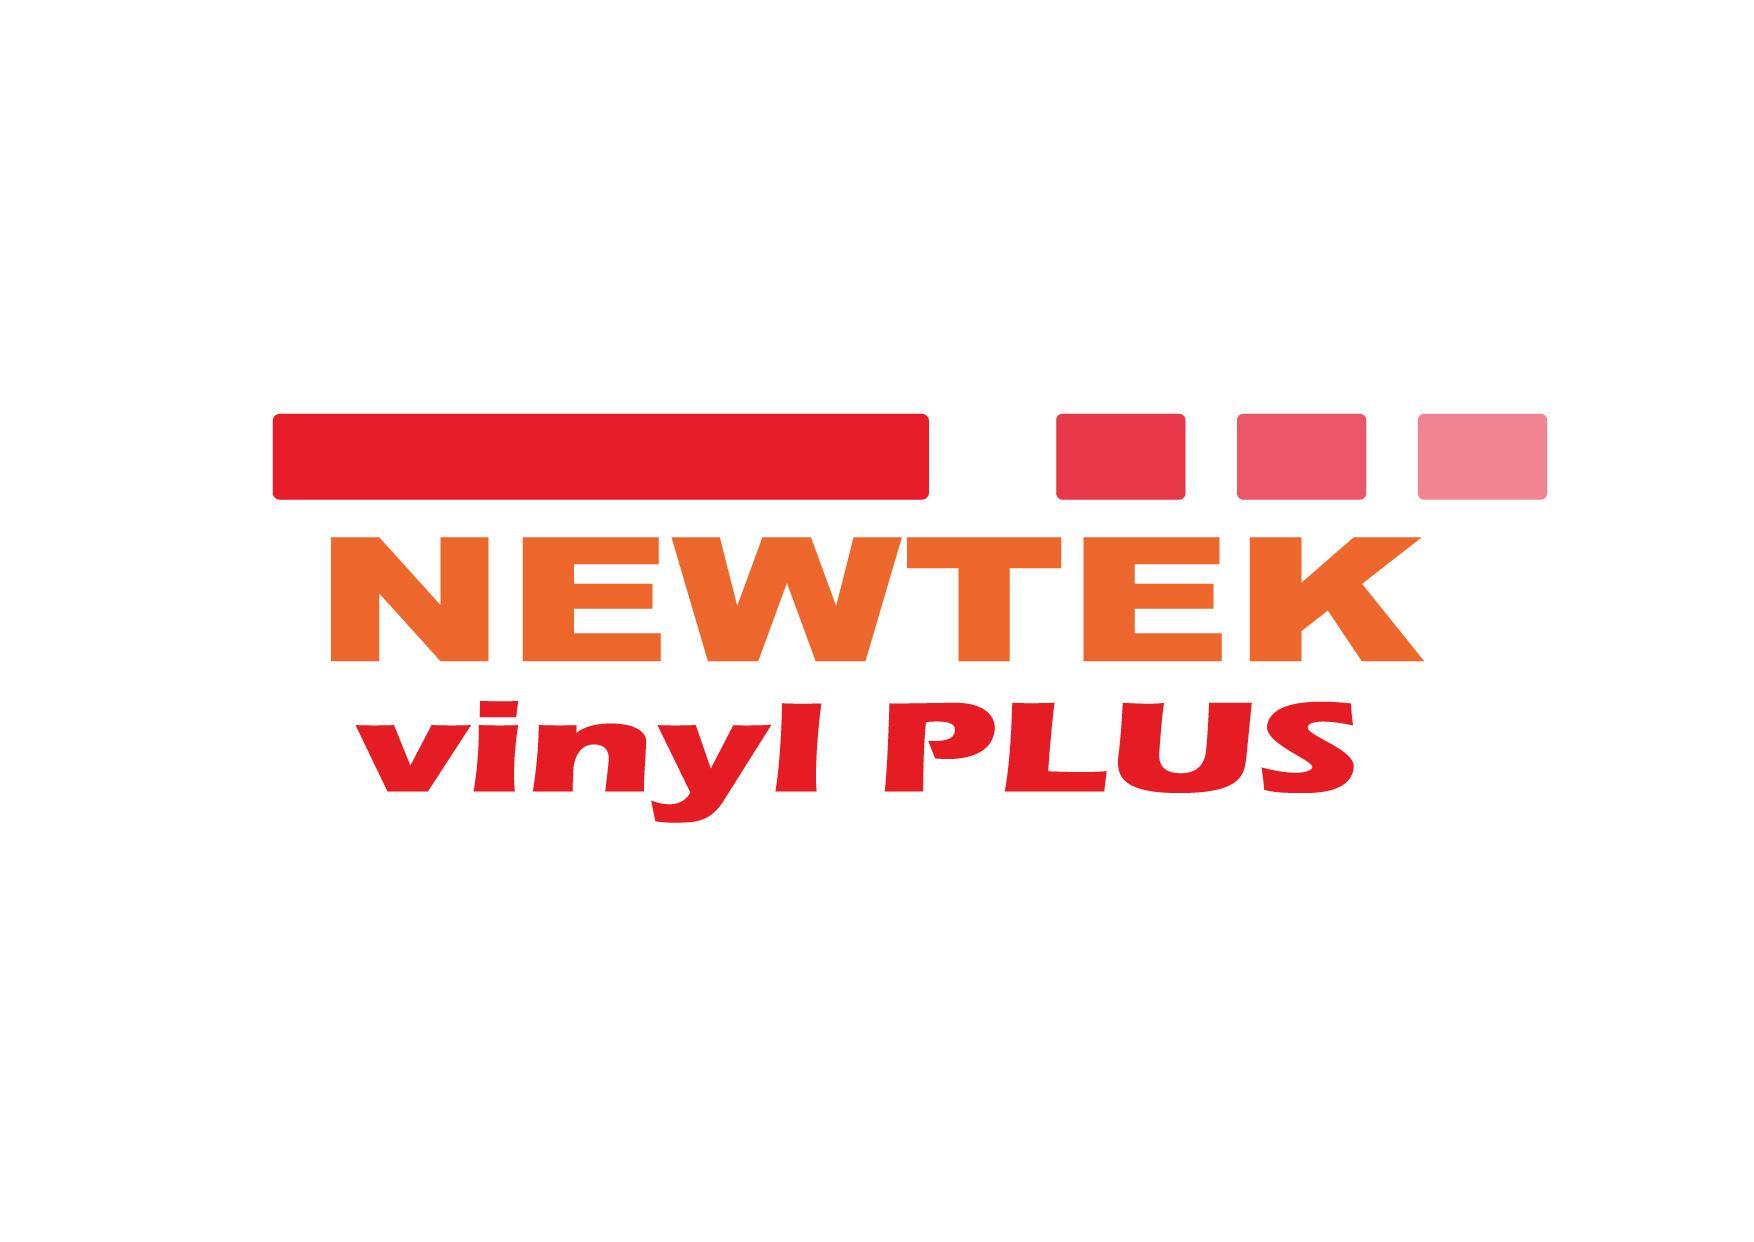 https://covialsa.com/wp-content/uploads/2019/12/logos_marca_covialsa_newtek-vinyl-plus.jpg